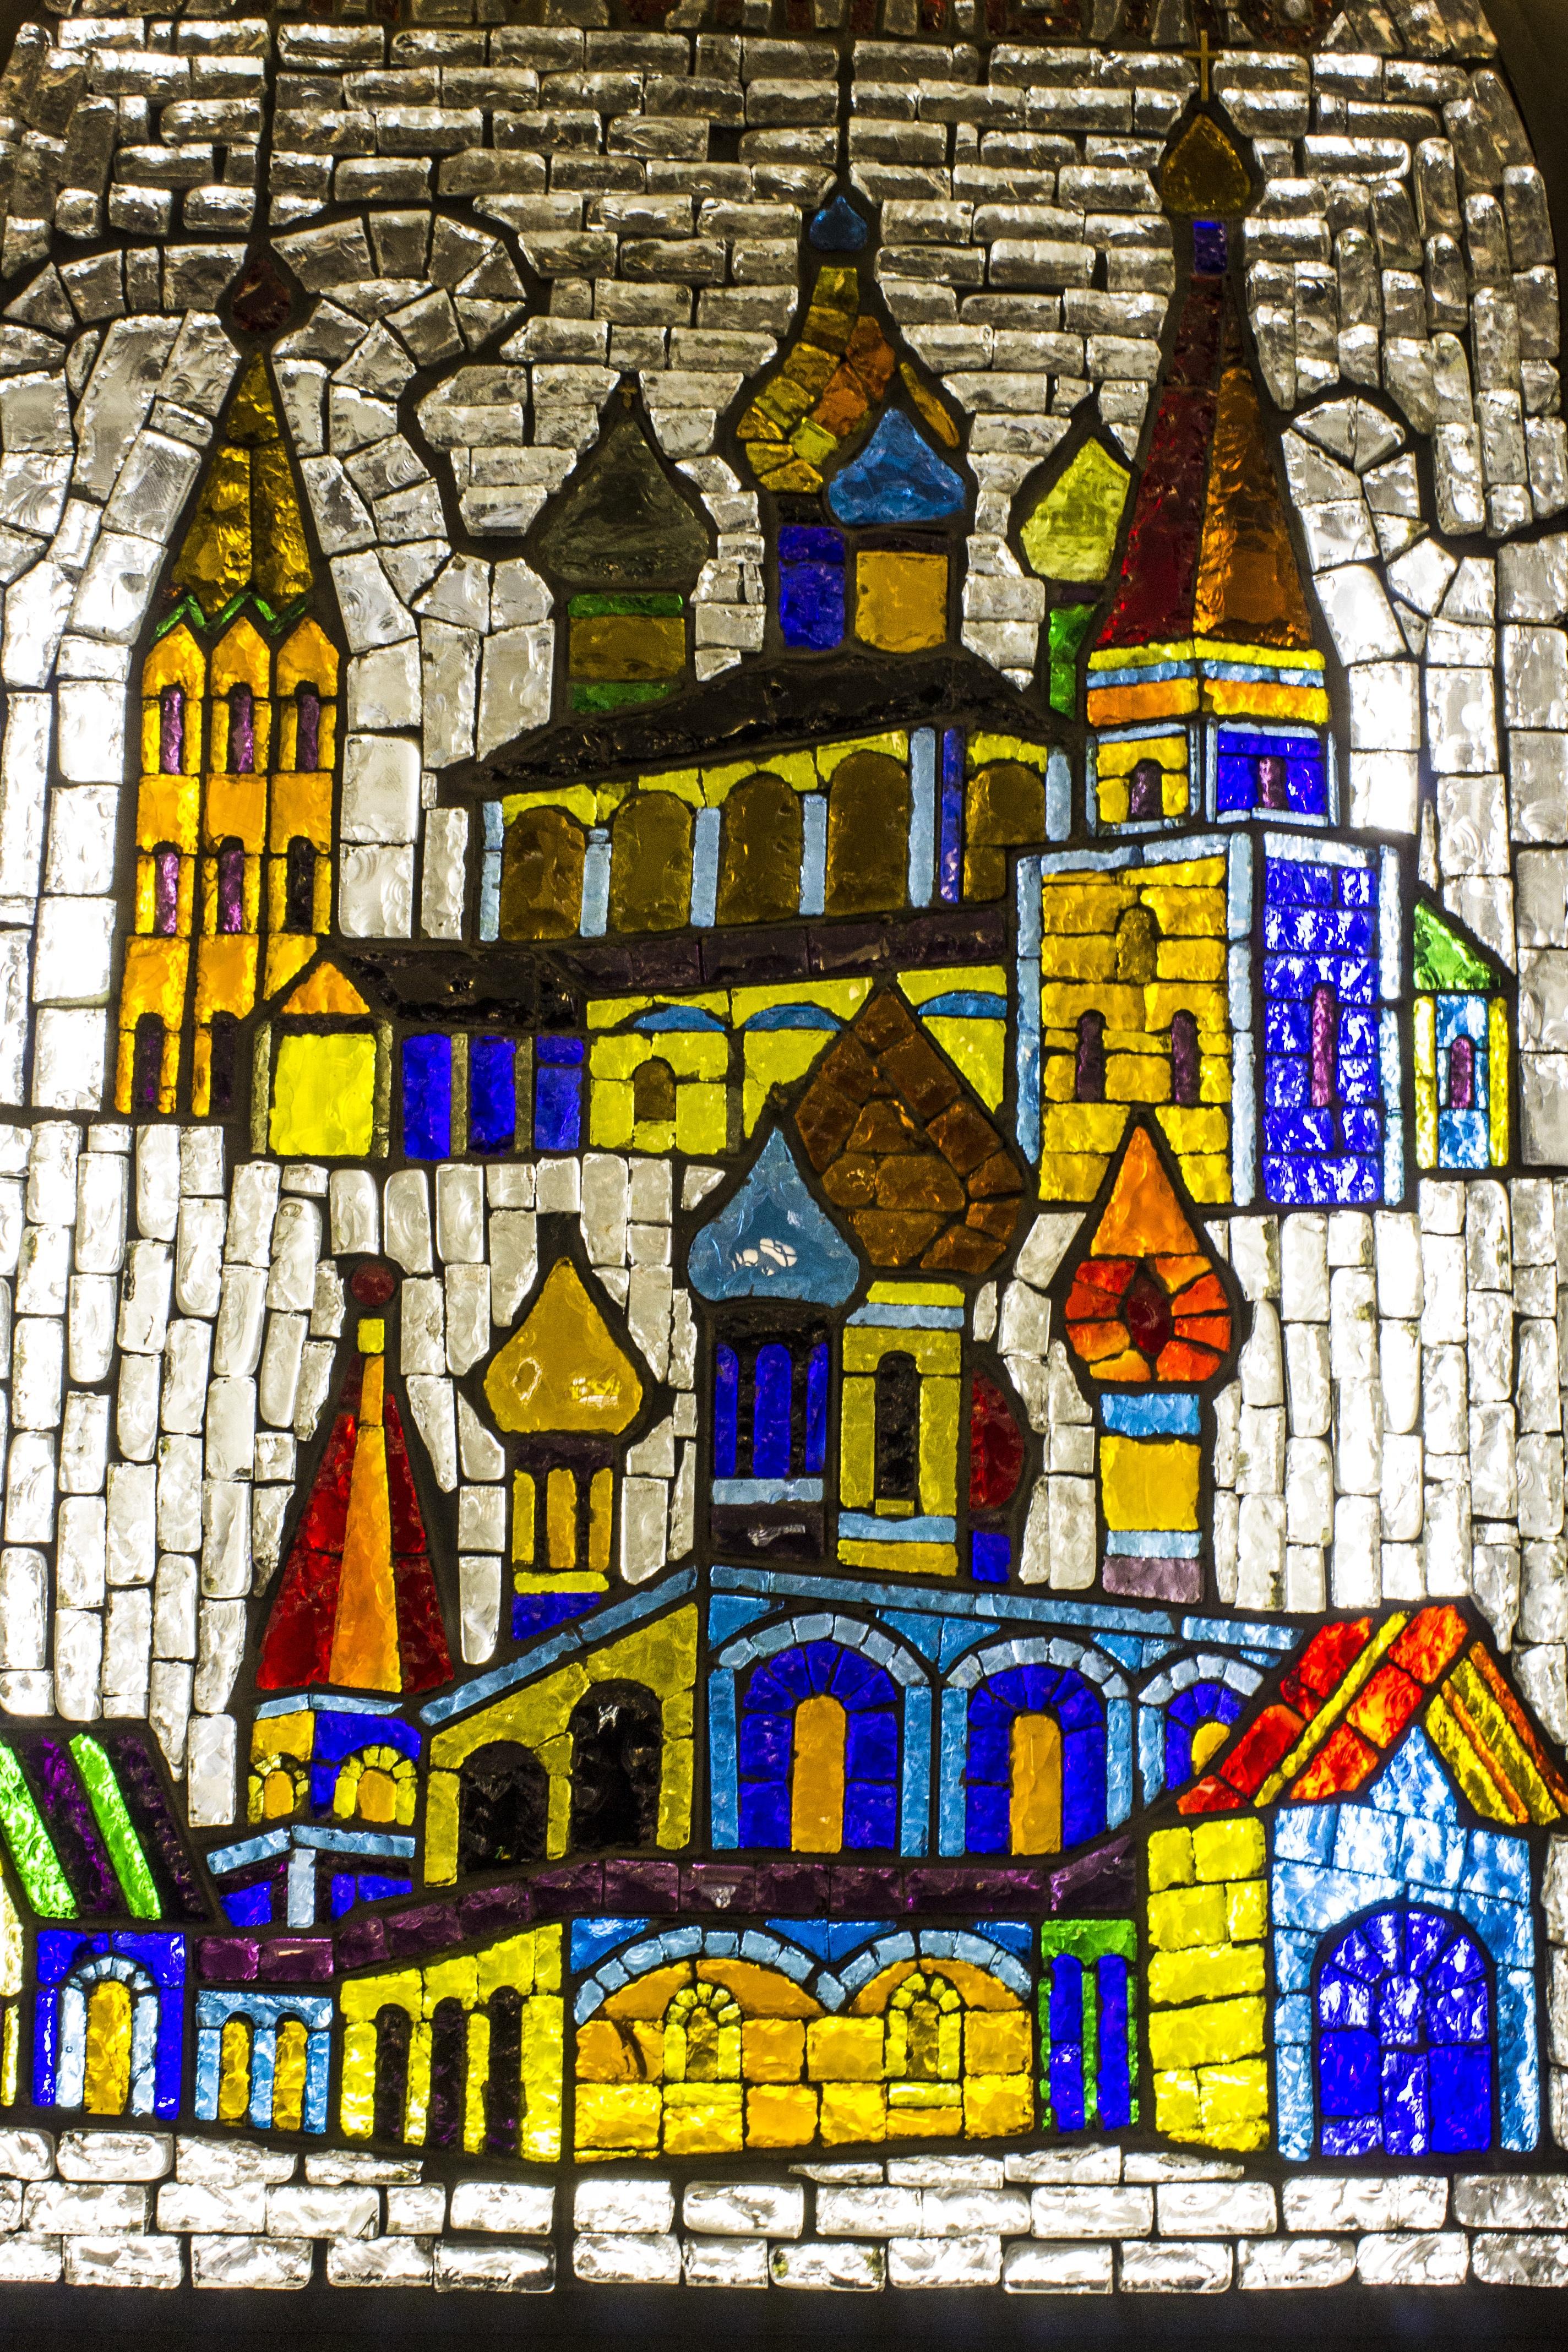 Fenster Glas Metro Farbe Farbe Dekor Material Glasmalerei Kunst Entwurf  Hell Mosaik  Schön Stil Moskau